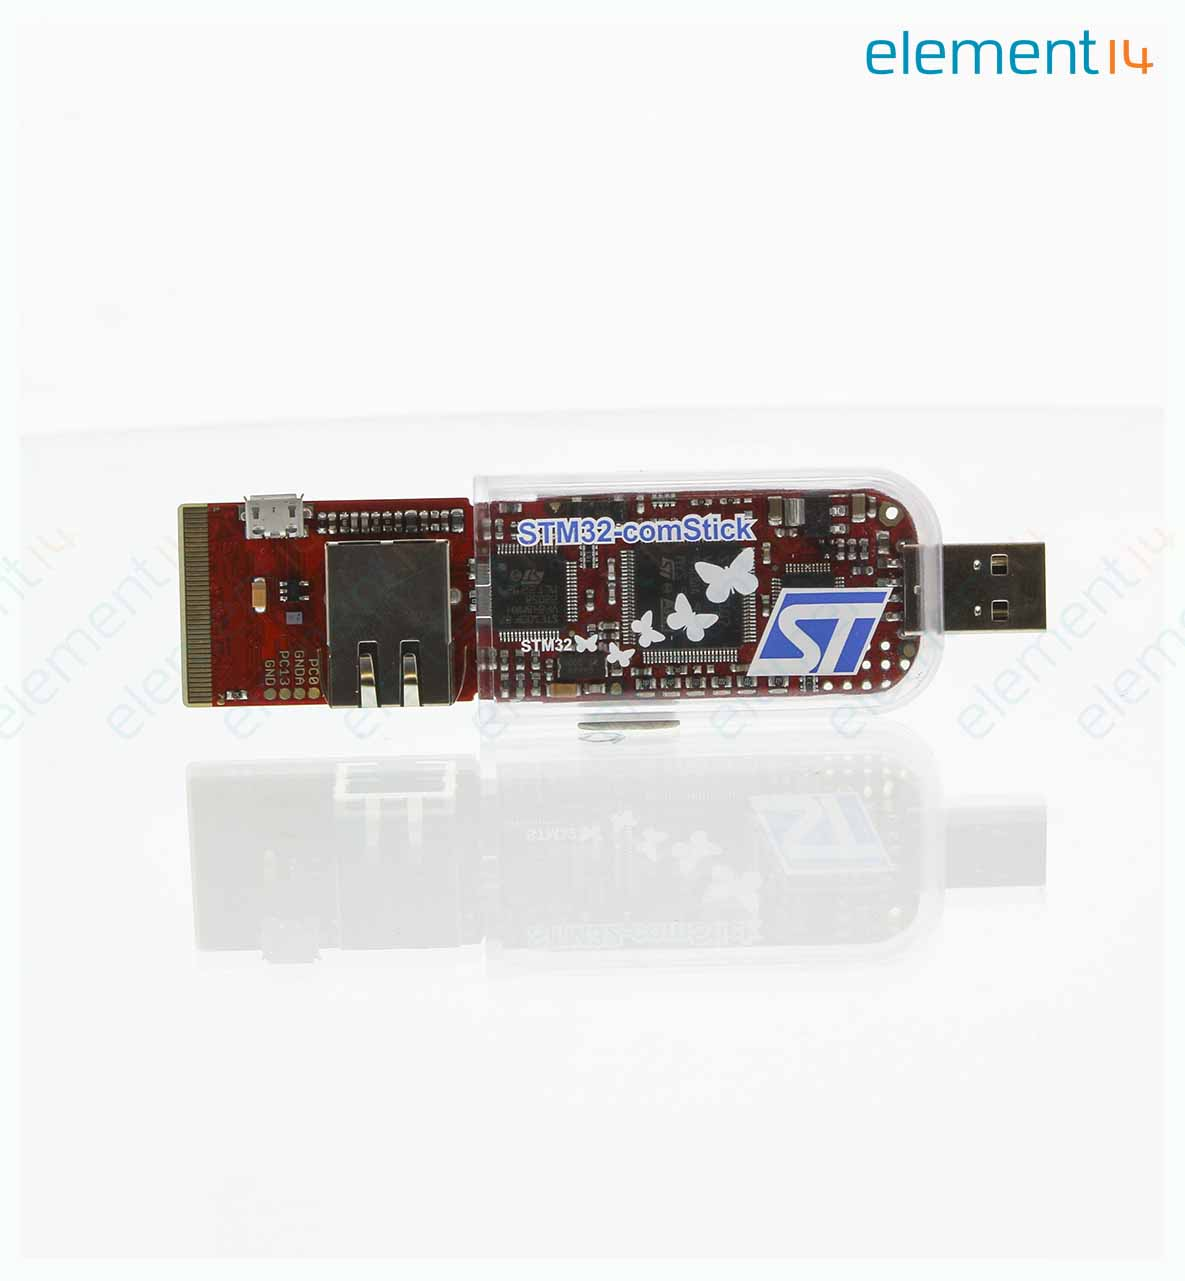 Development Kit, Embedded Network, Debugging/Programming via Dedicated USB  Connector